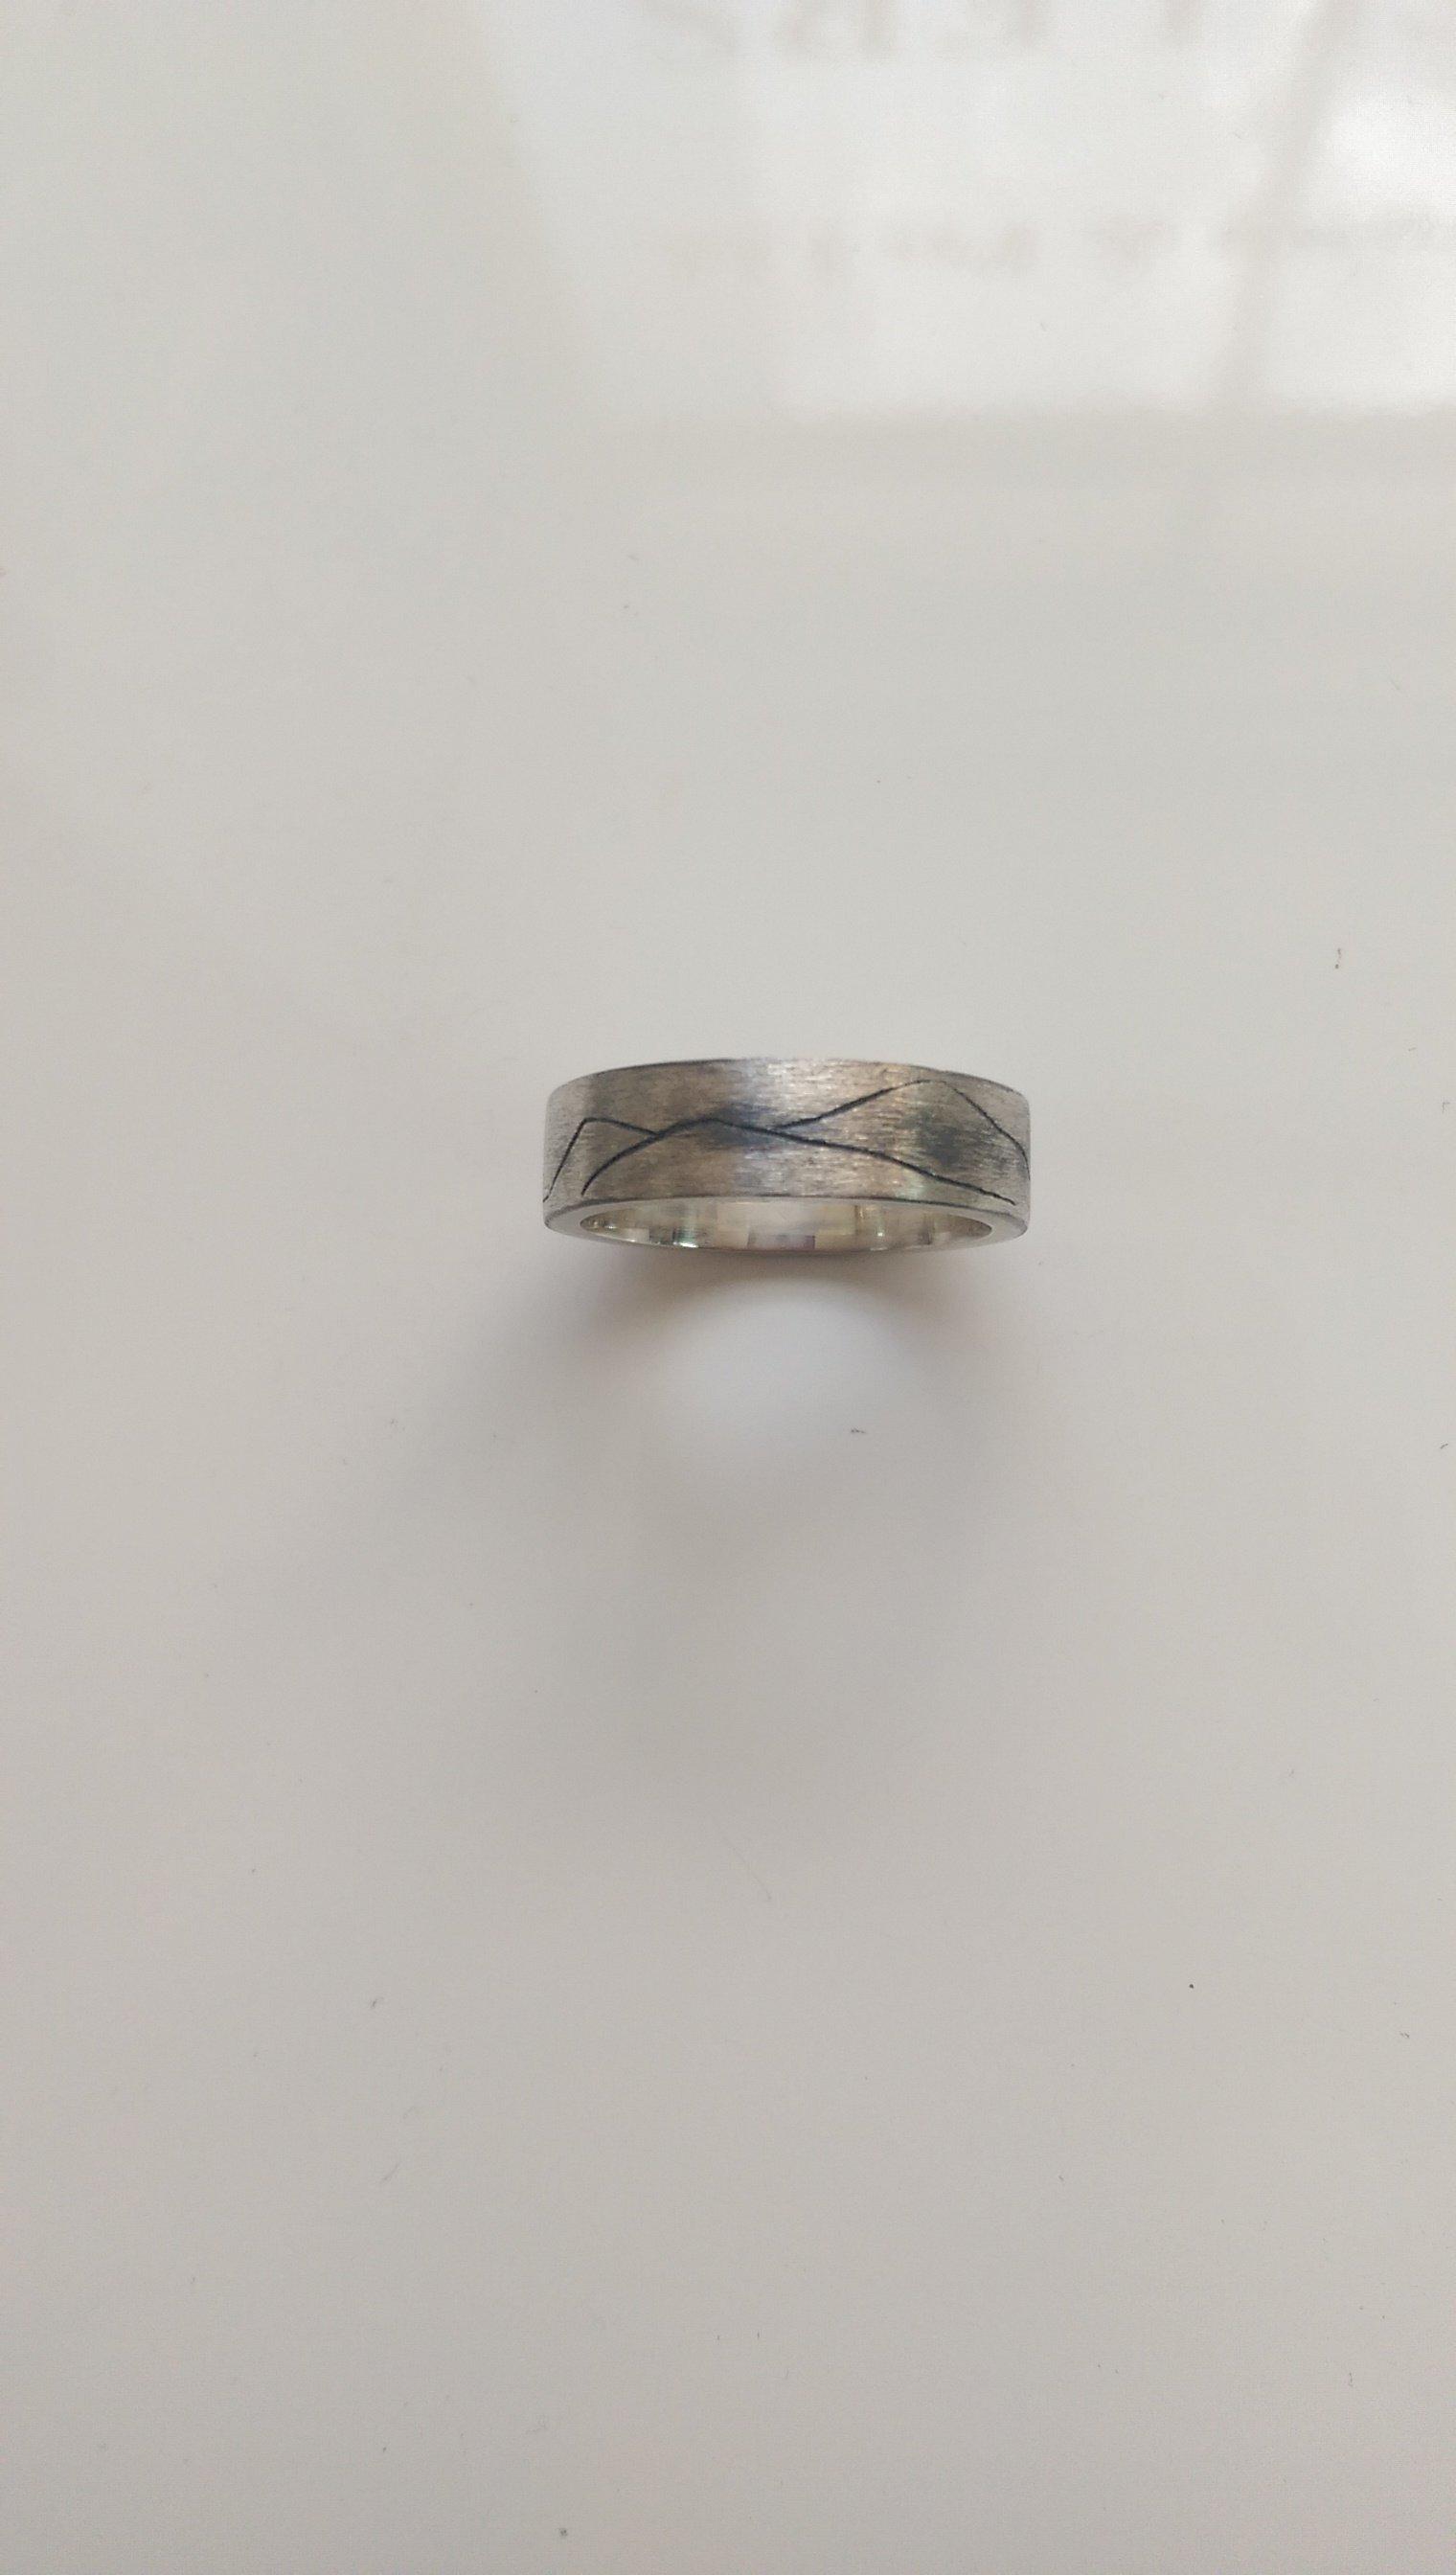 An engraved wedding ring